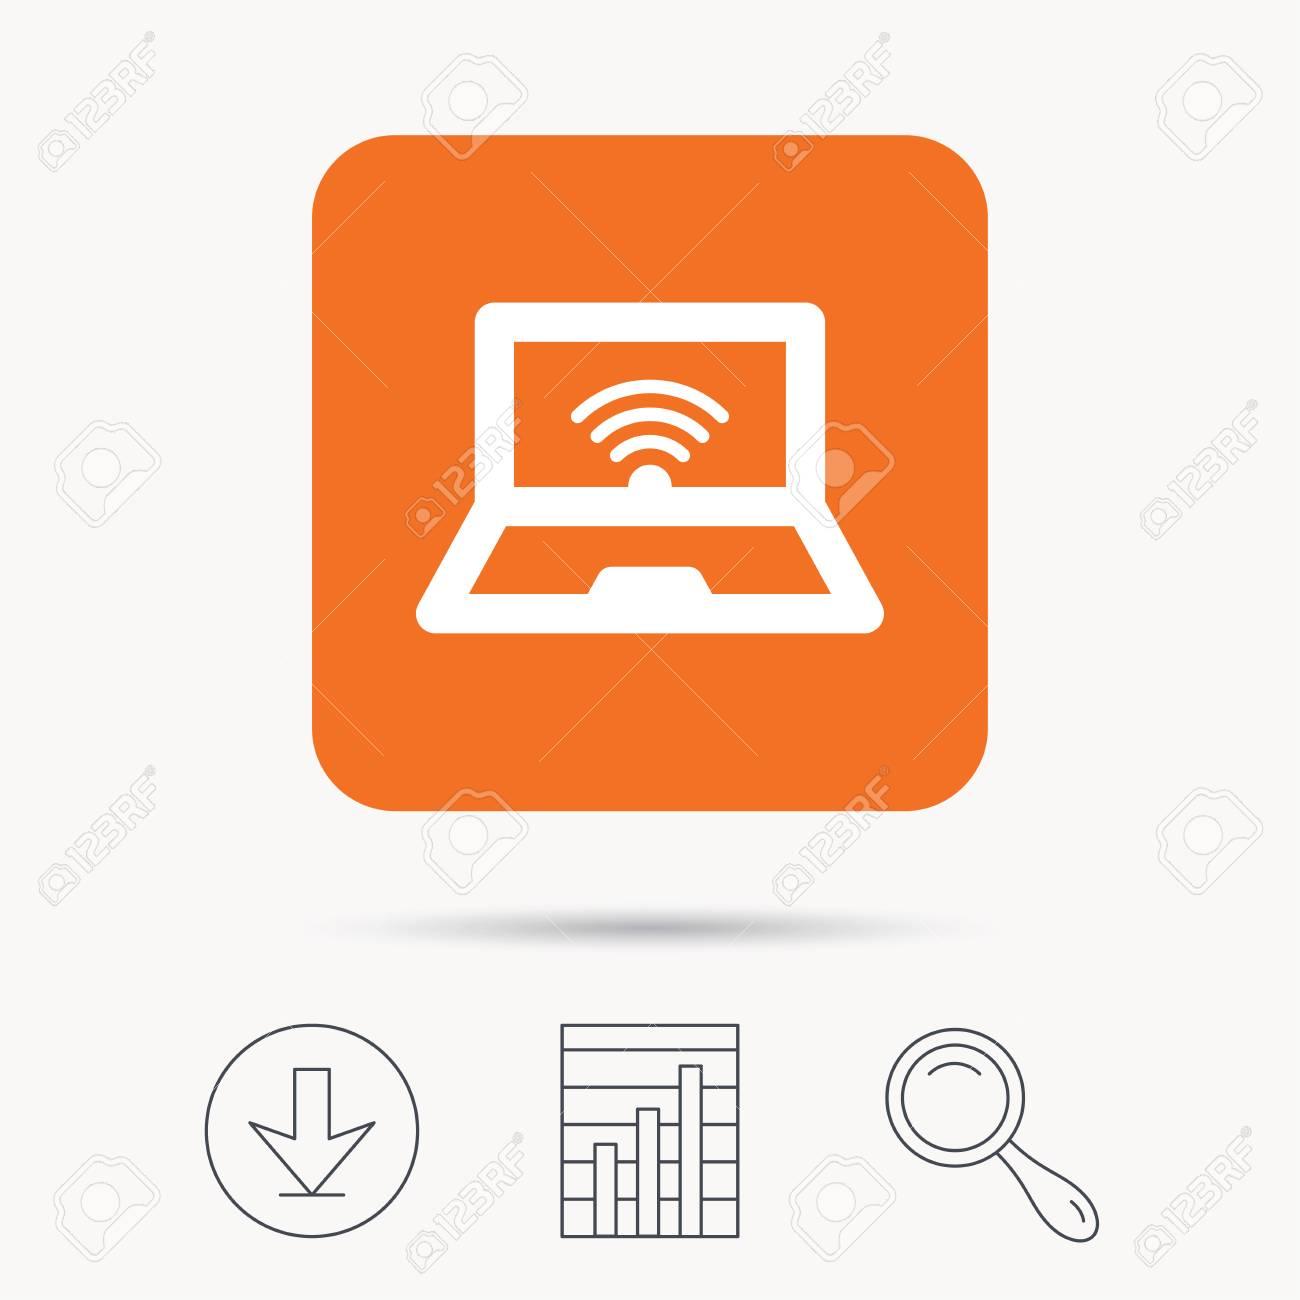 Download ralink 802. 11n usb wifi wireless driver setup windows 7.